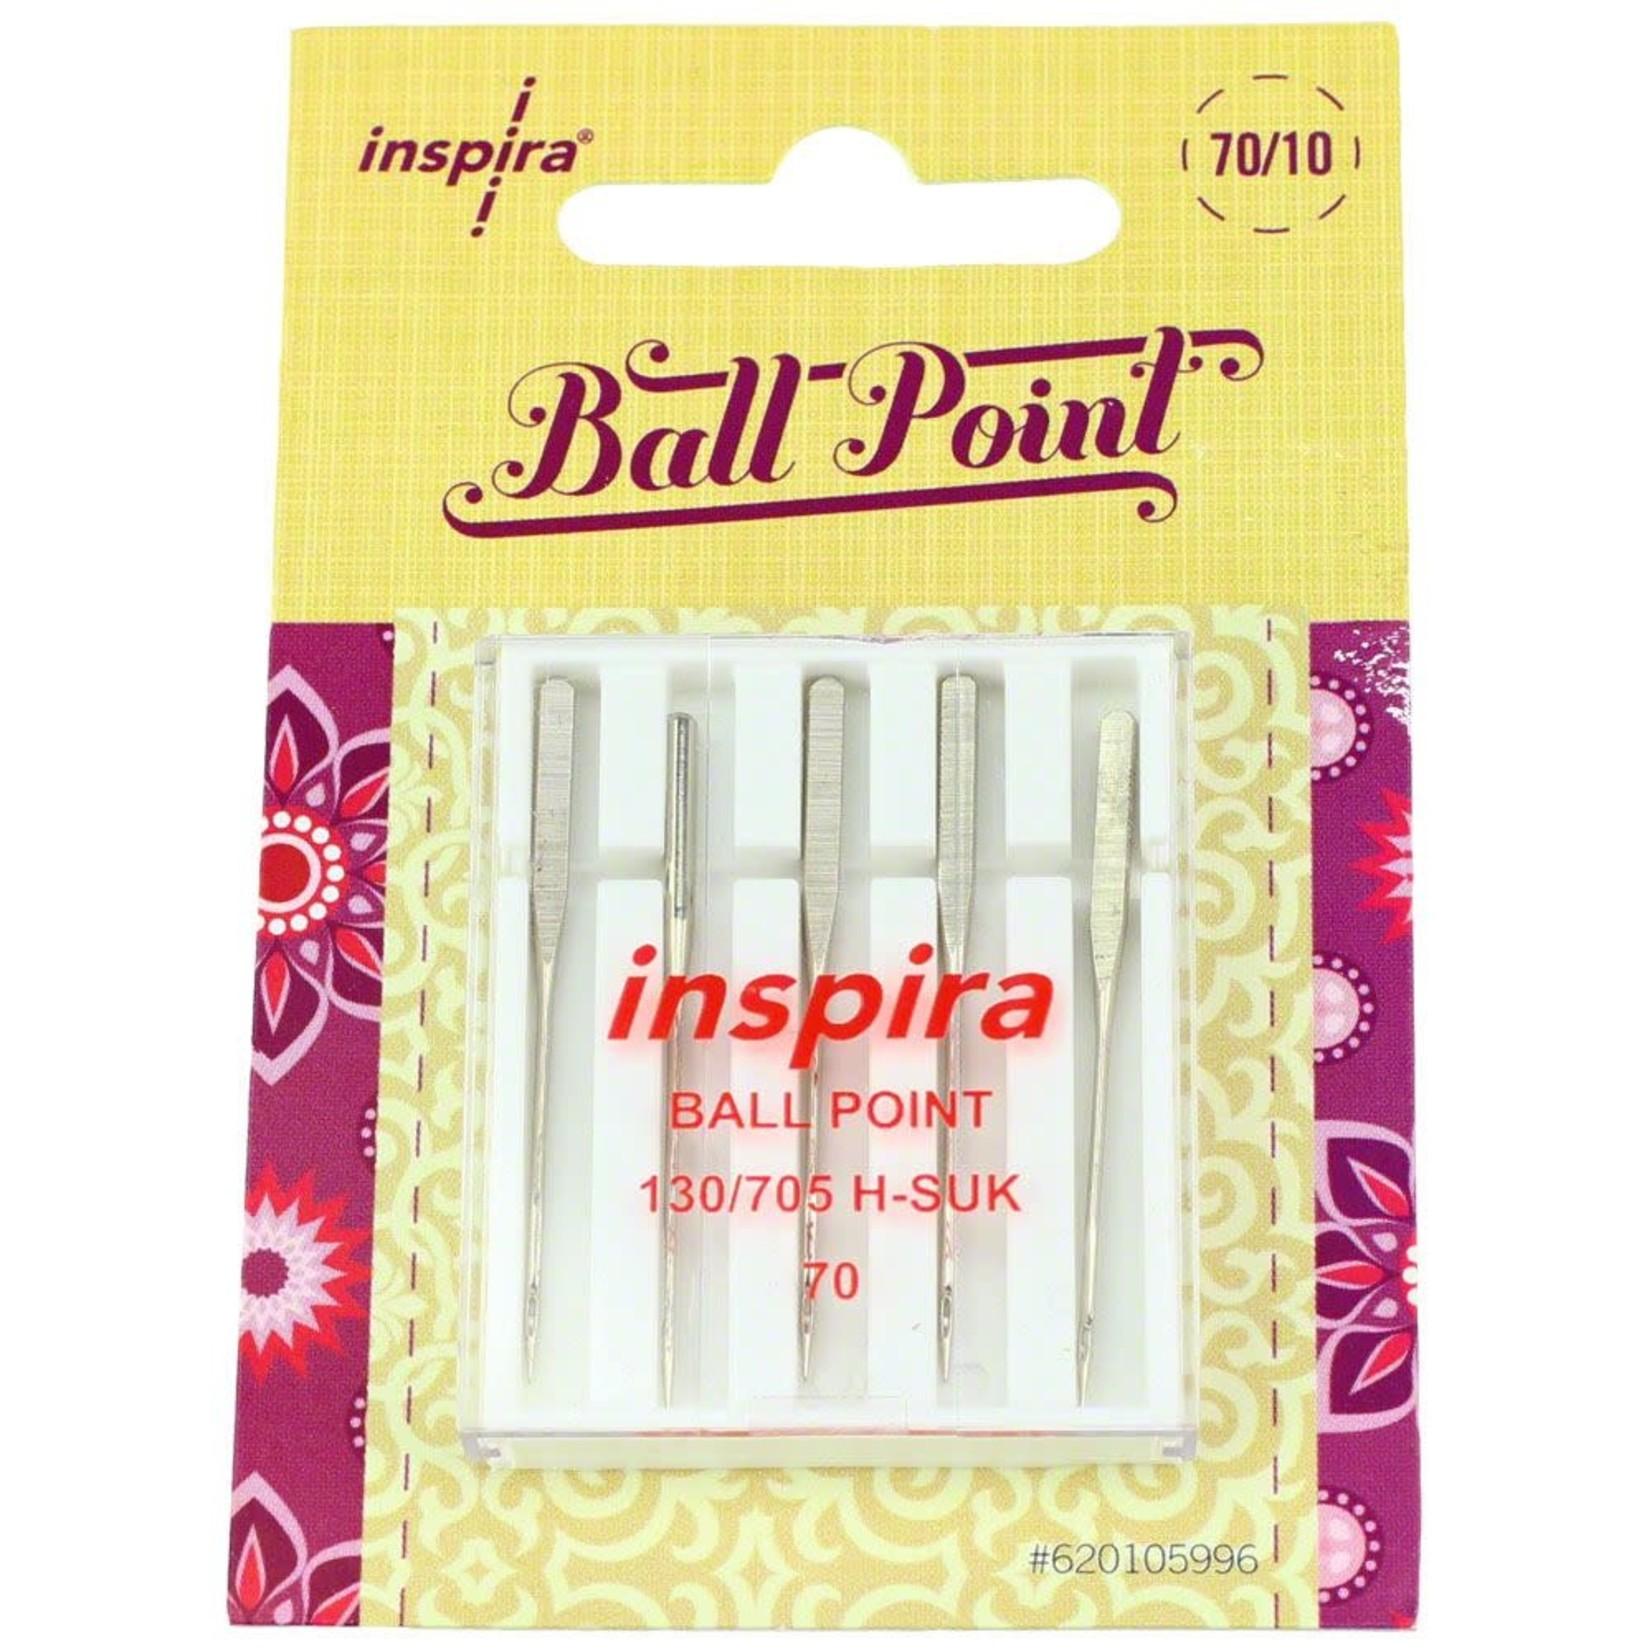 INSPIRA INSPIRA BALL POINT NEEDLE 70/10